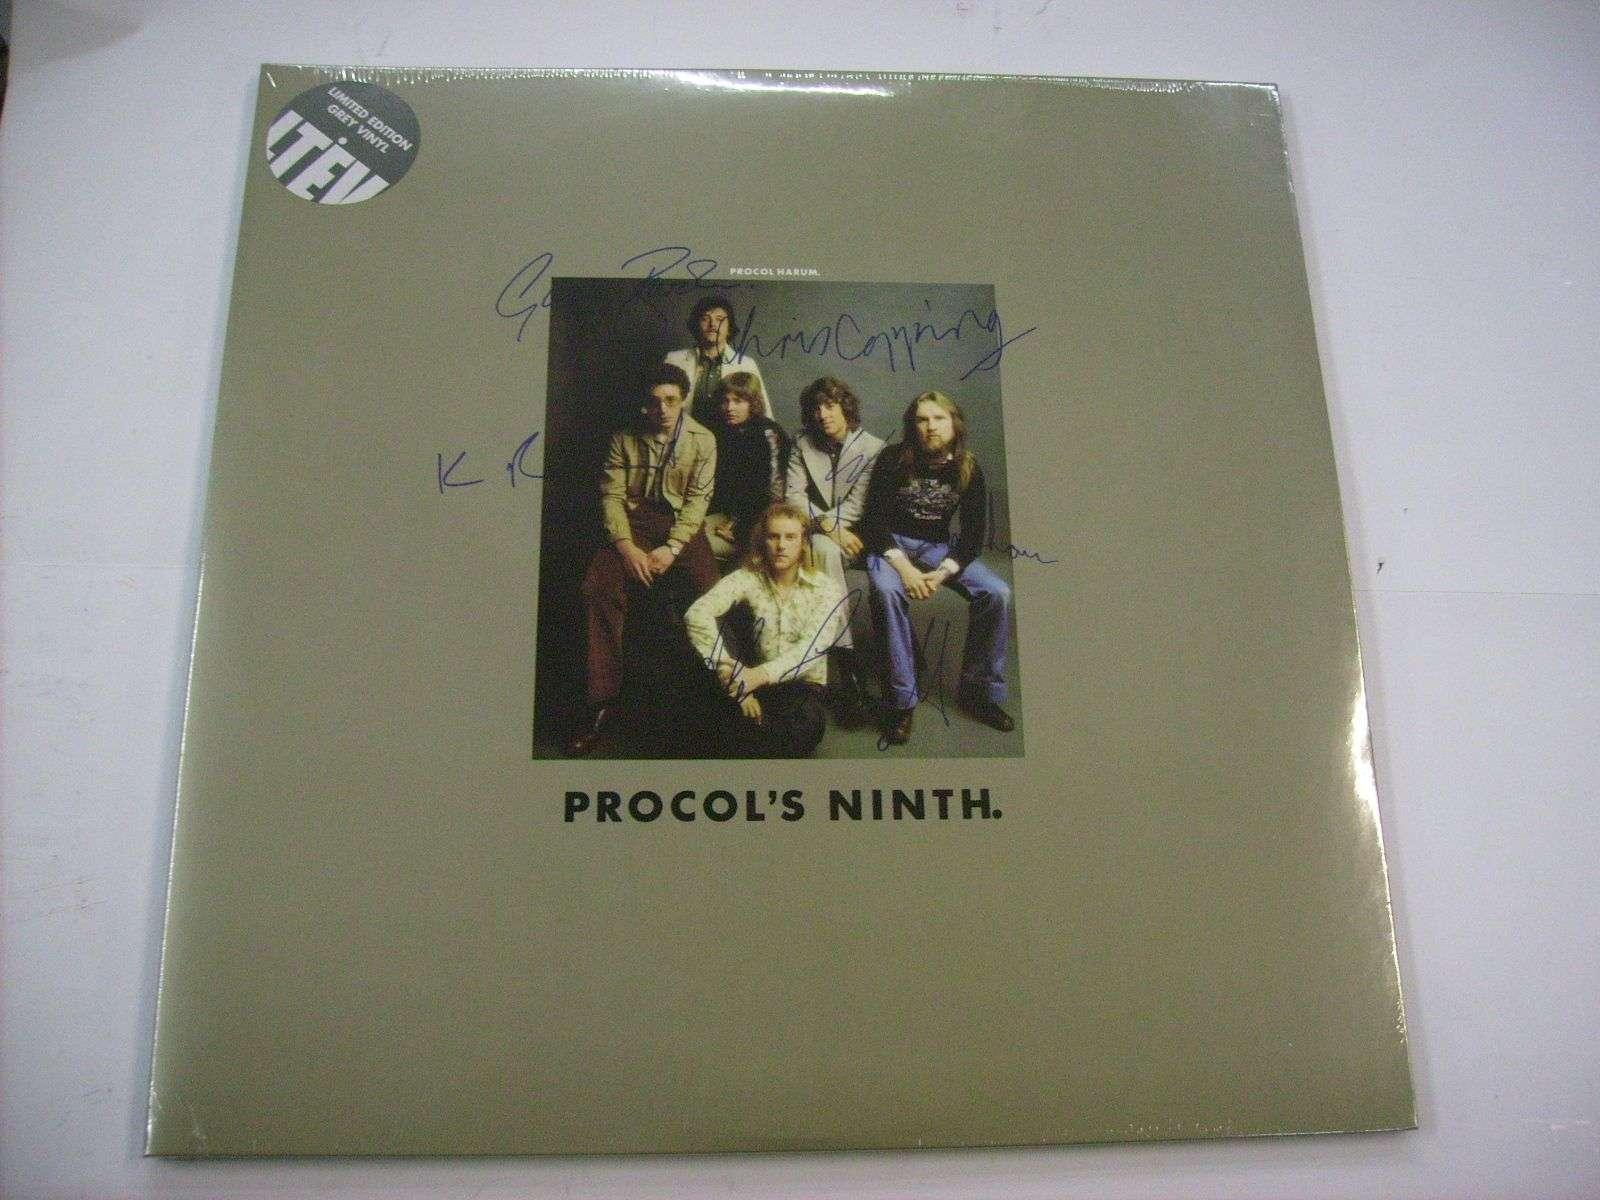 Procol Harum - Procol's Ninth (2lp)